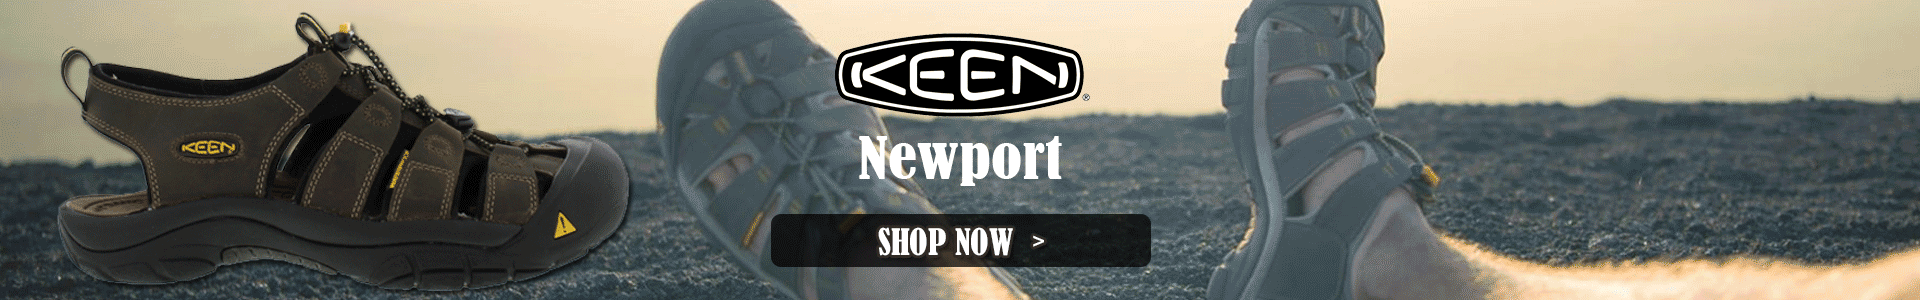 Shop Keen Newport